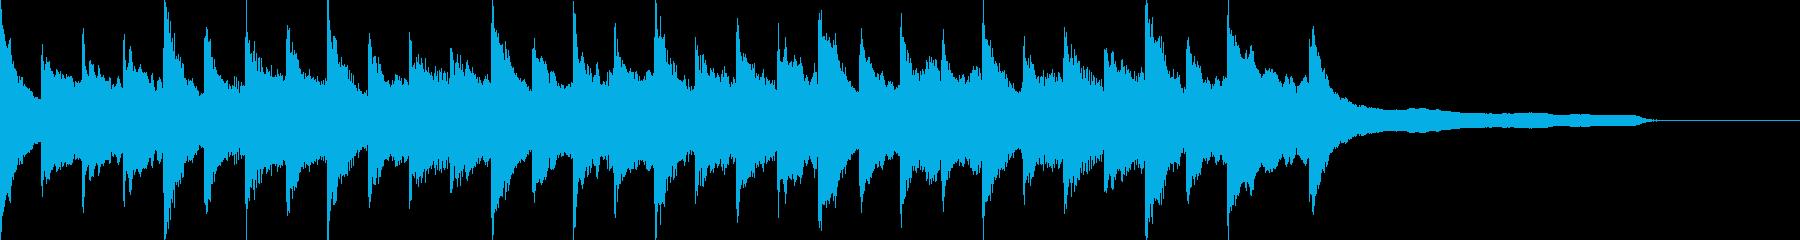 Cinematic Piano&Strings 4の再生済みの波形